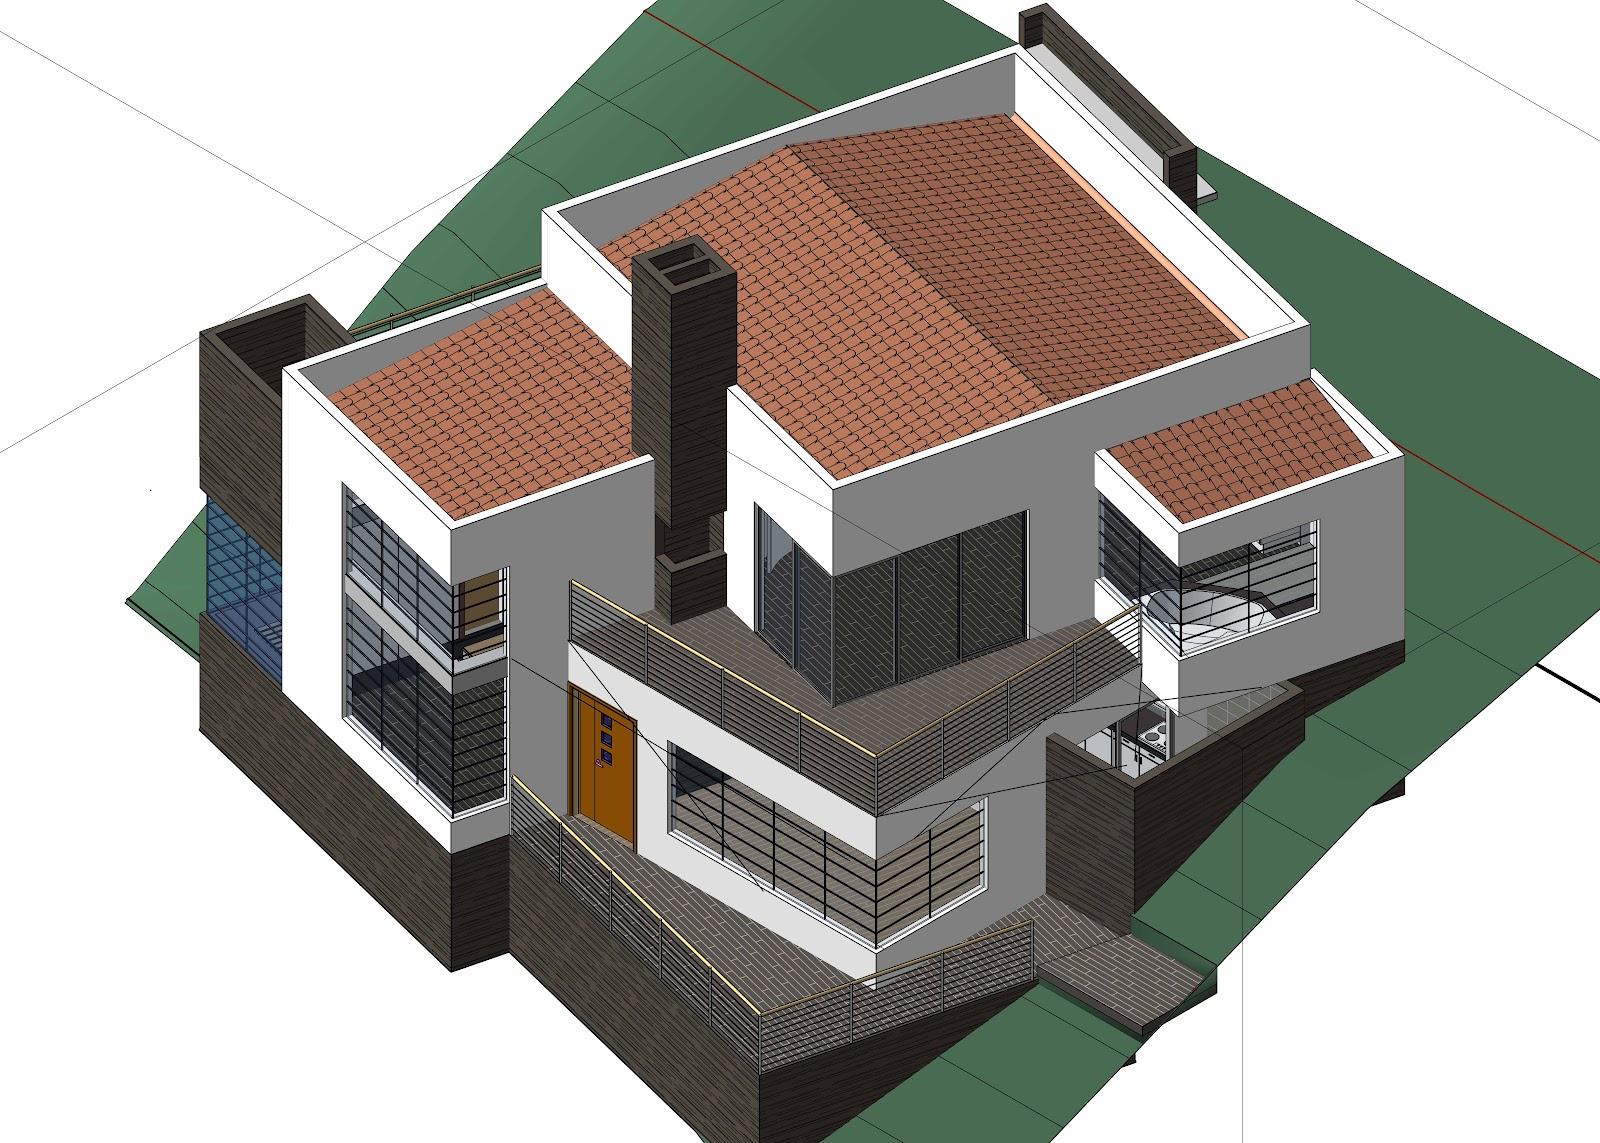 Dise os arquitectonicos 3d medellin diese os for Normas para planos arquitectonicos